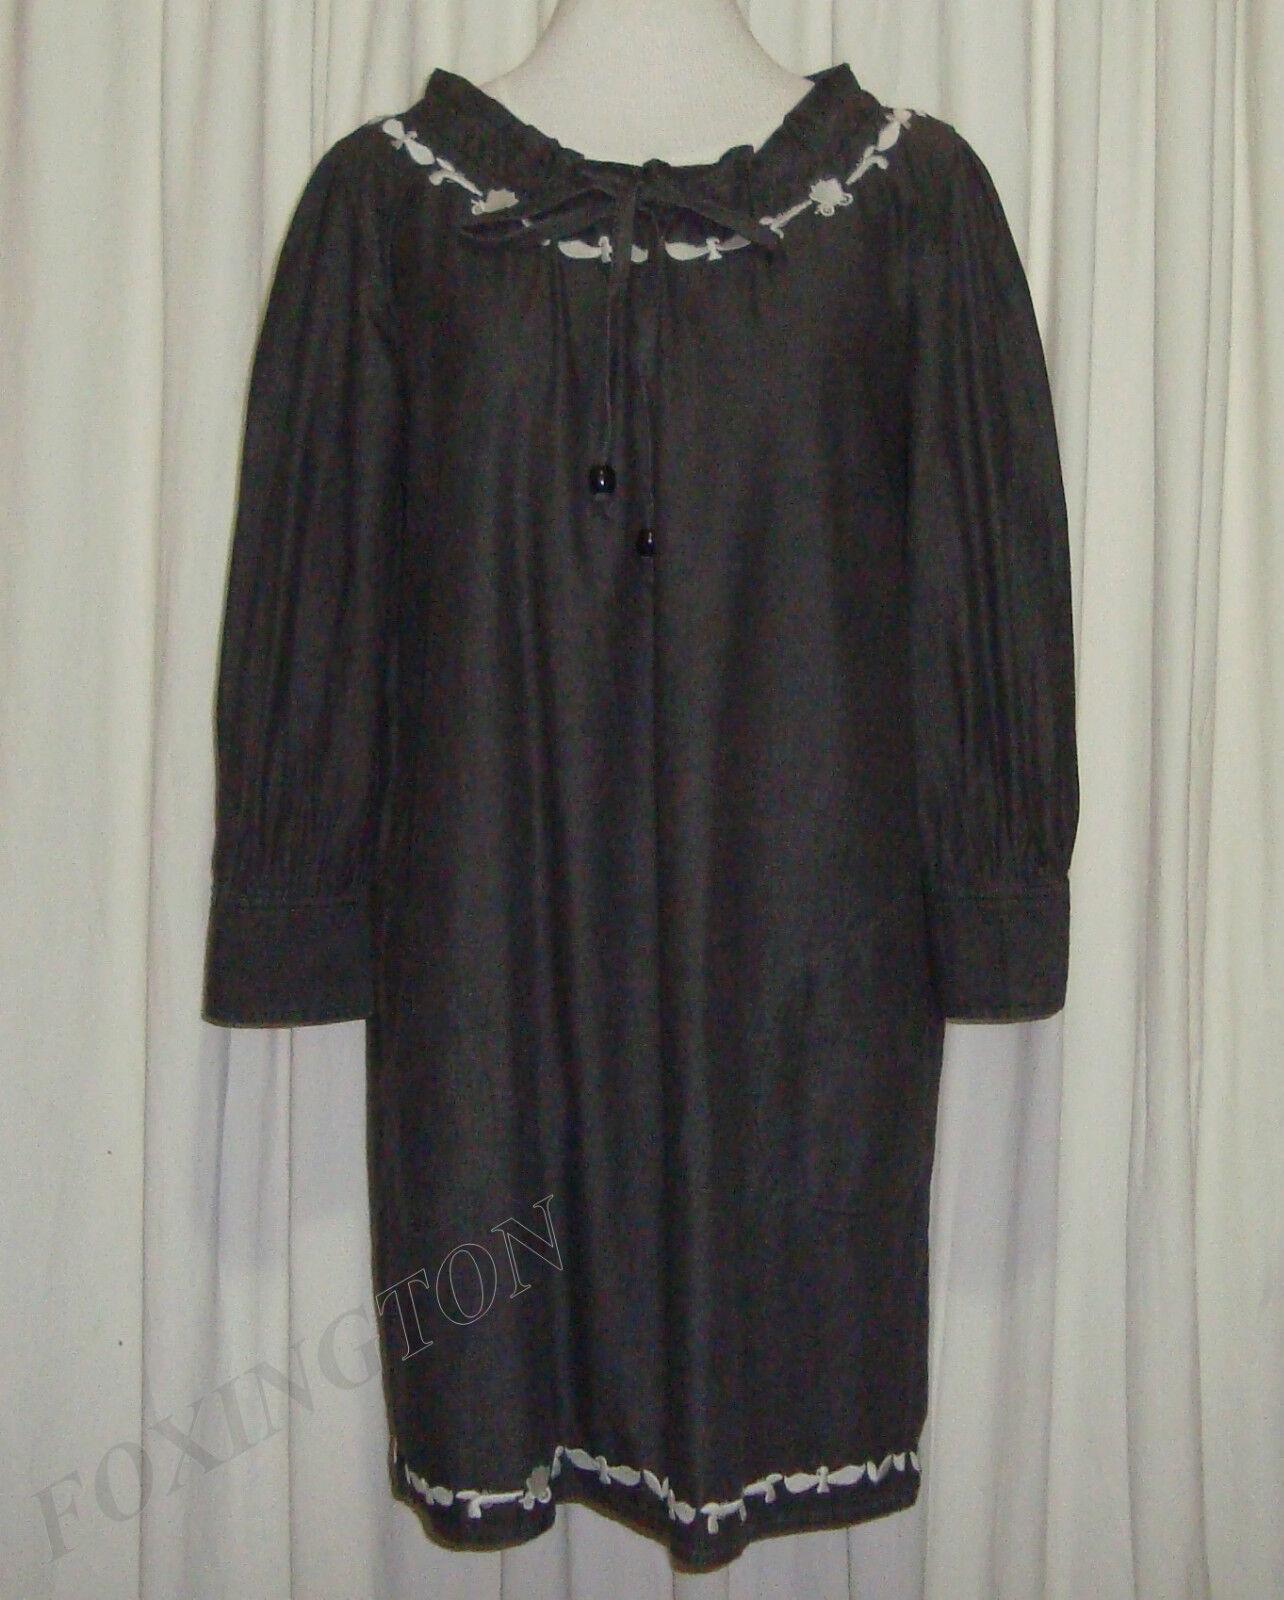 ZIMMERMANN DARK GREY EMBROIDERED DRESS MATERNITY DRESS size 2 (AUS 12 14,US 6 8)